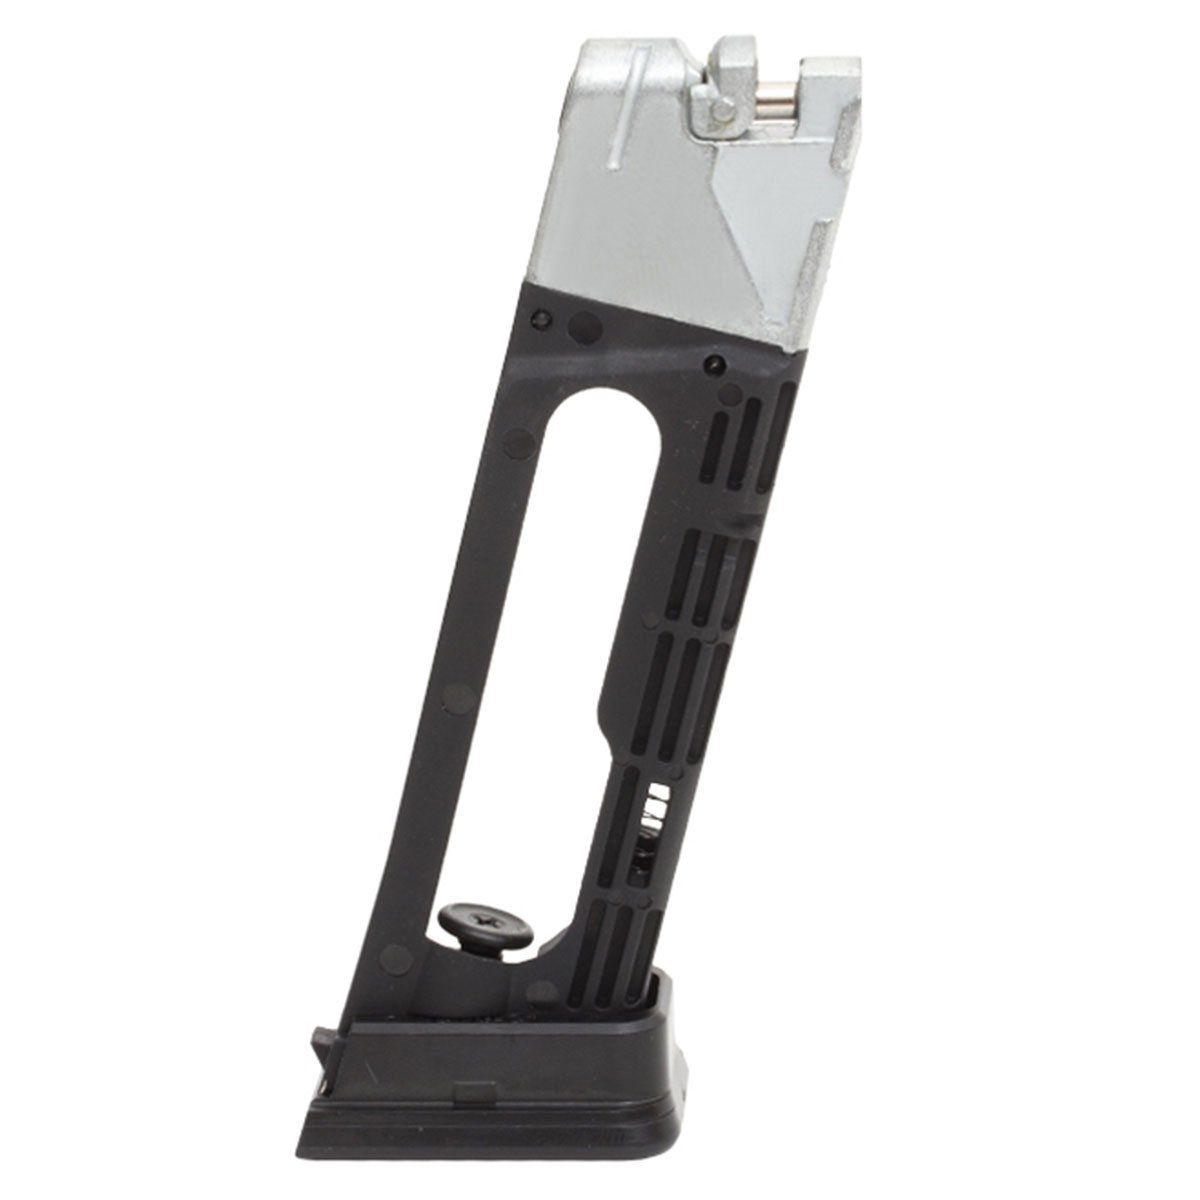 Magazine Para Arma de Pressão CO2 Wingun W119 4,5mm